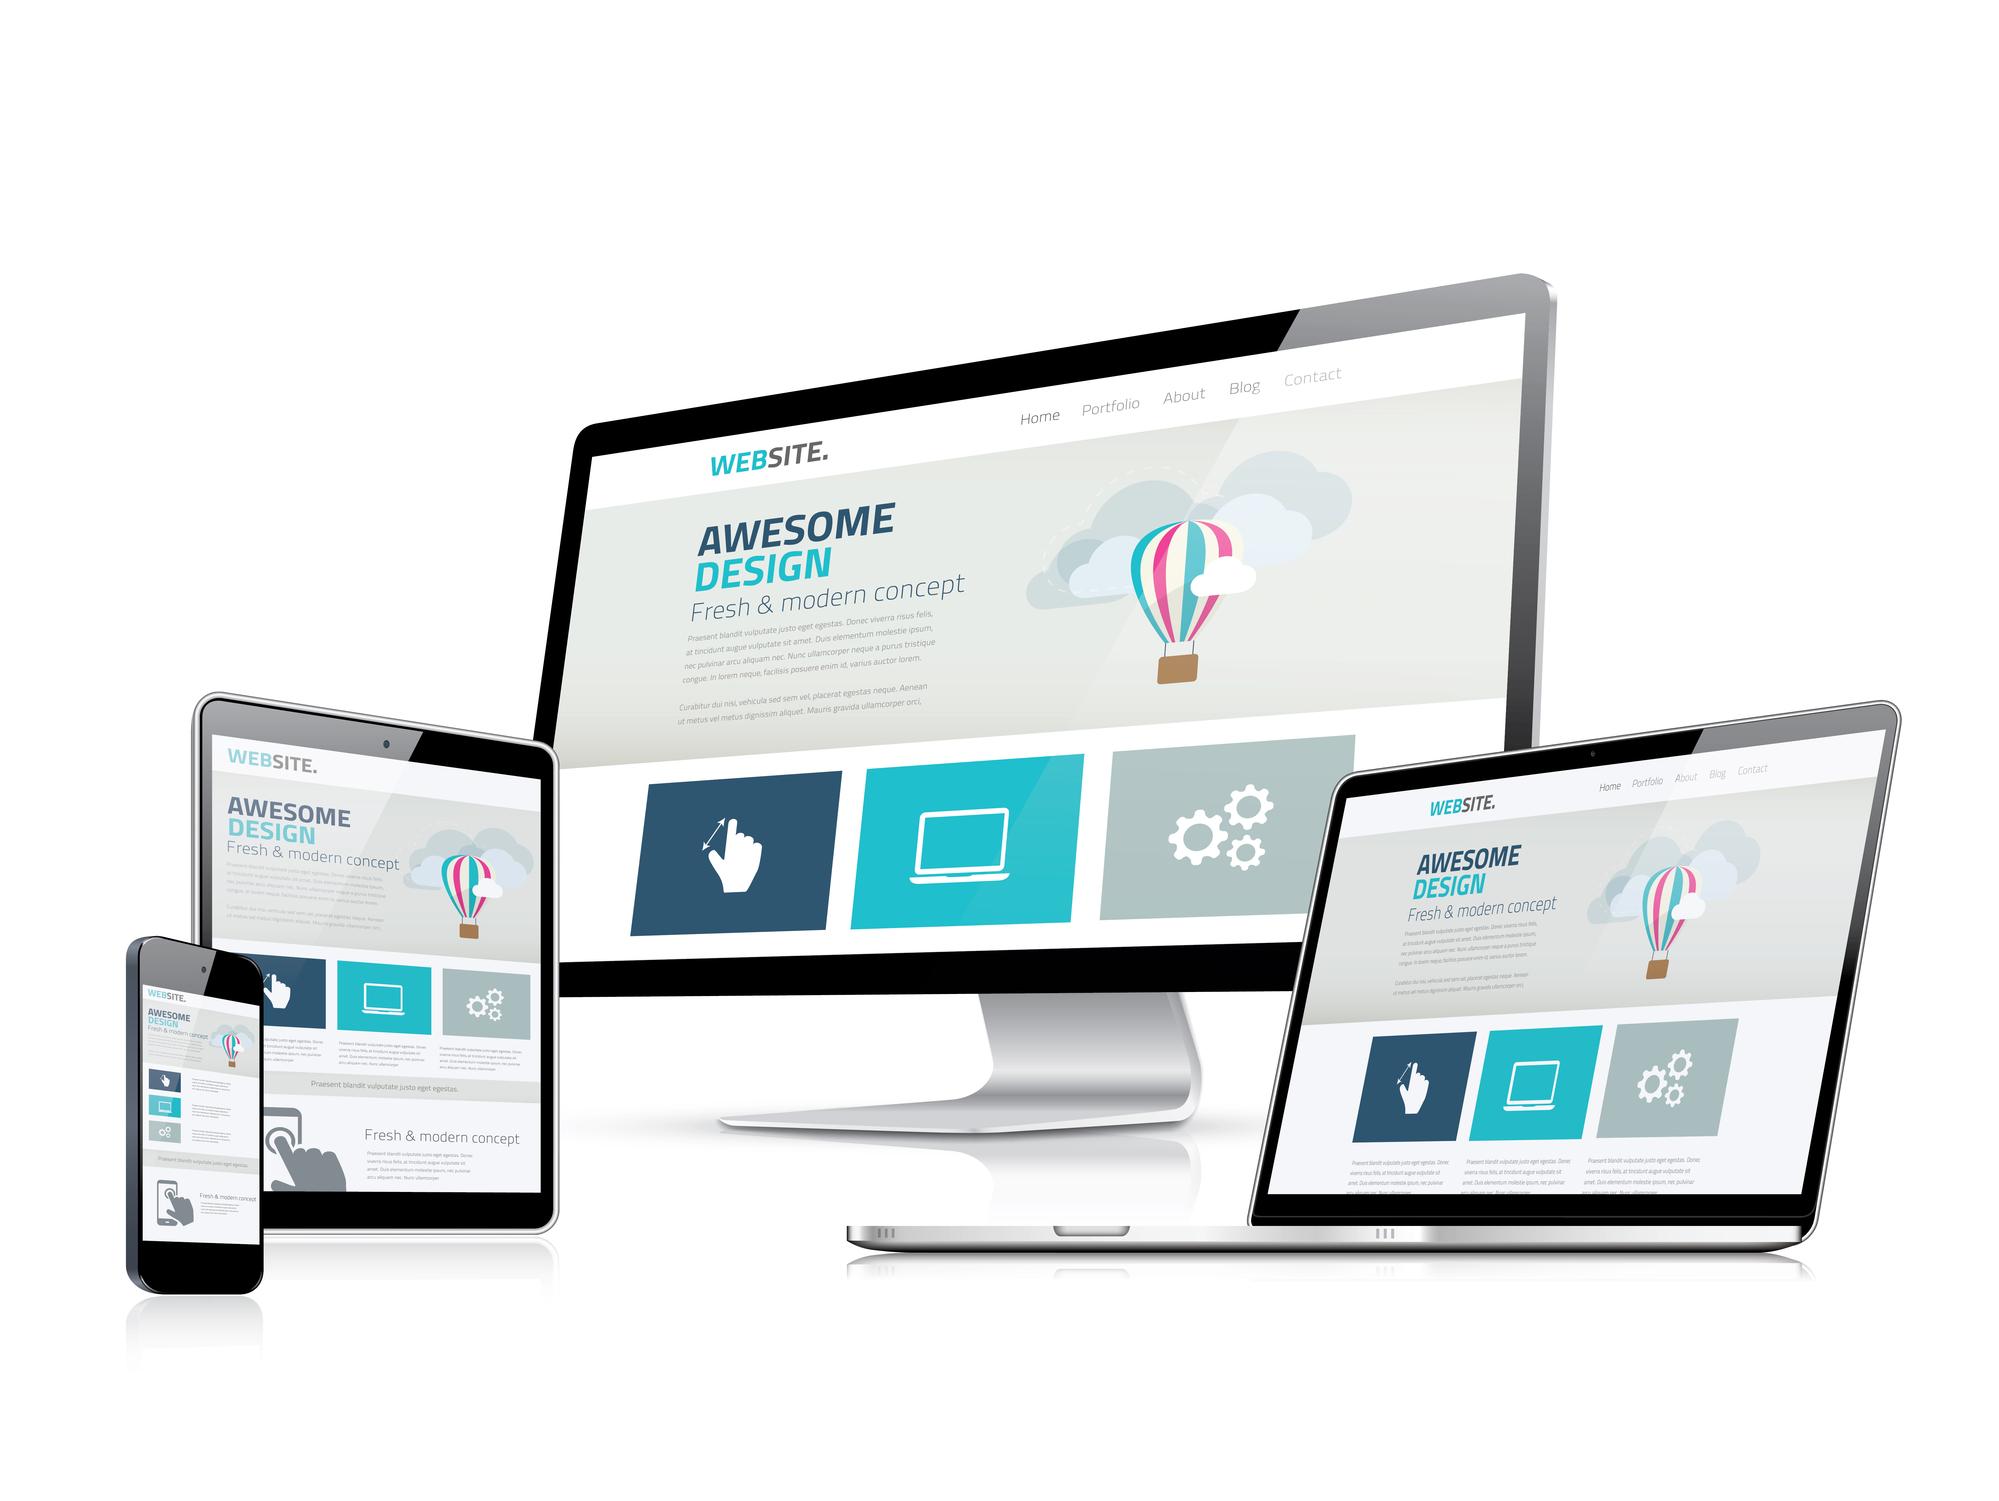 Awesome responsive web design development side vector displays property management website